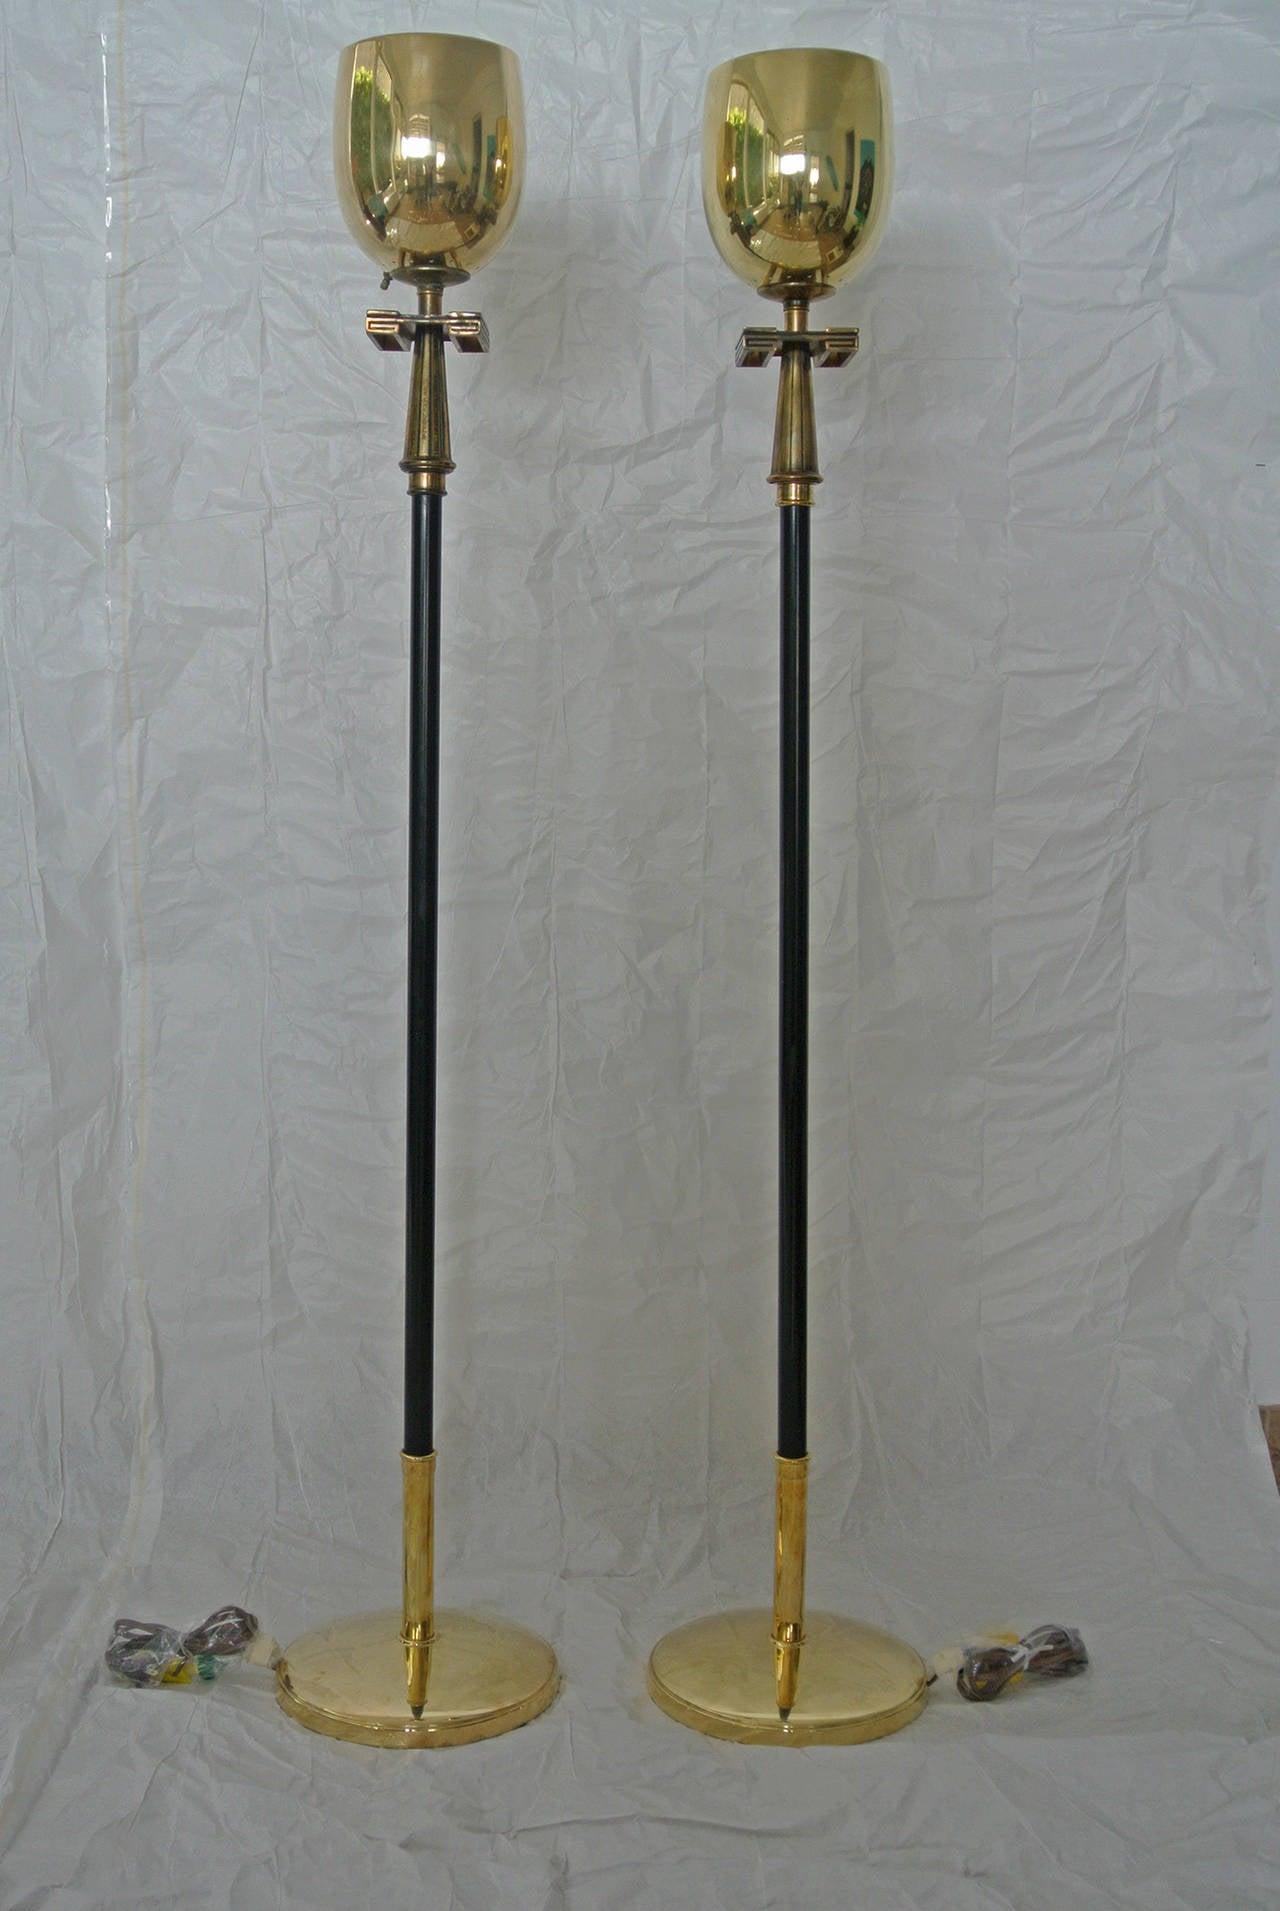 Stiffel Pair Of Brass Torchere Floor Lamps With Greek Key